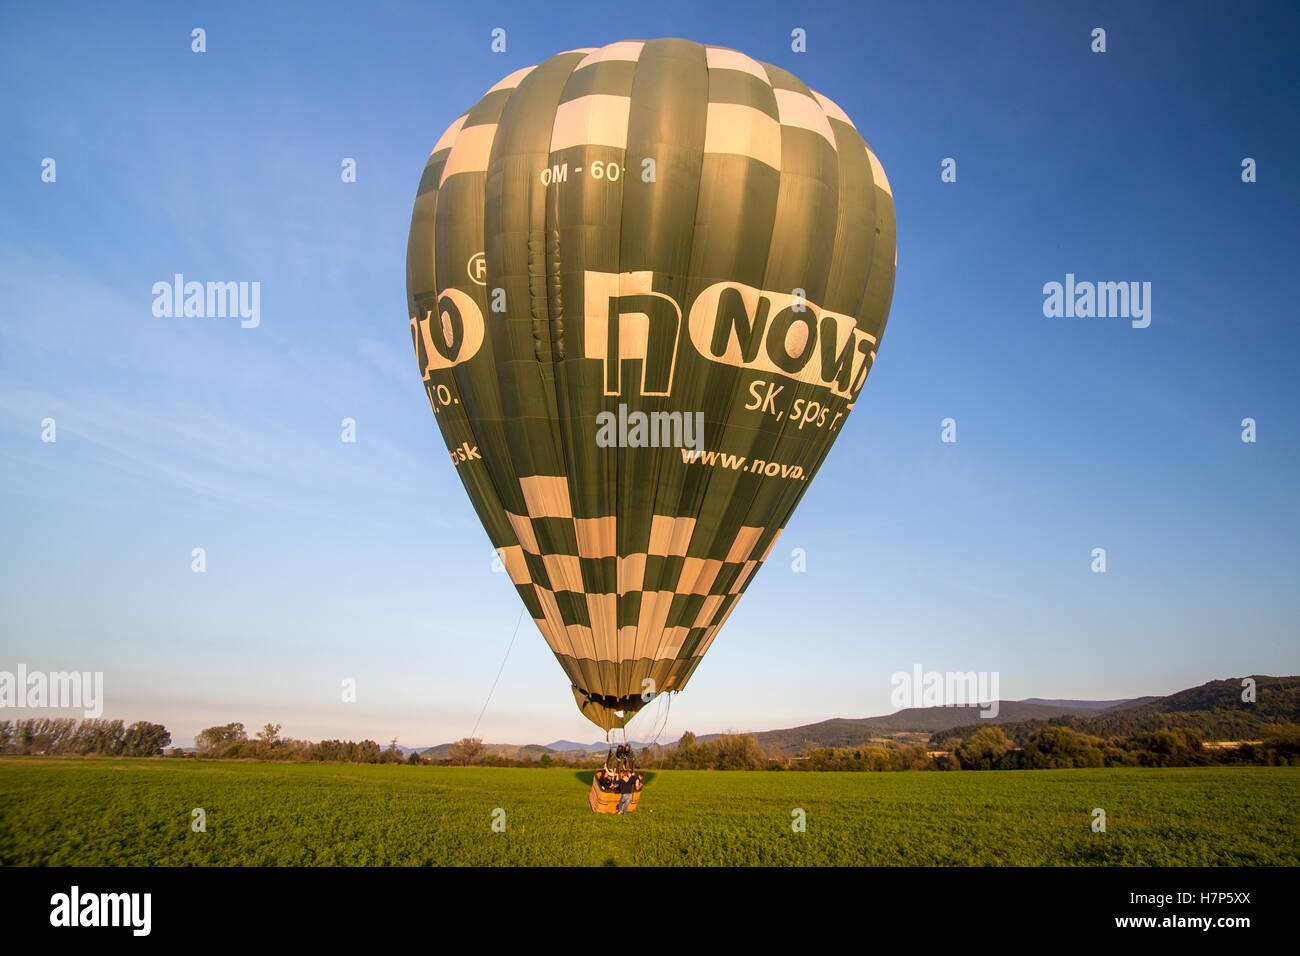 Hot air baloon taking off - Stock Image